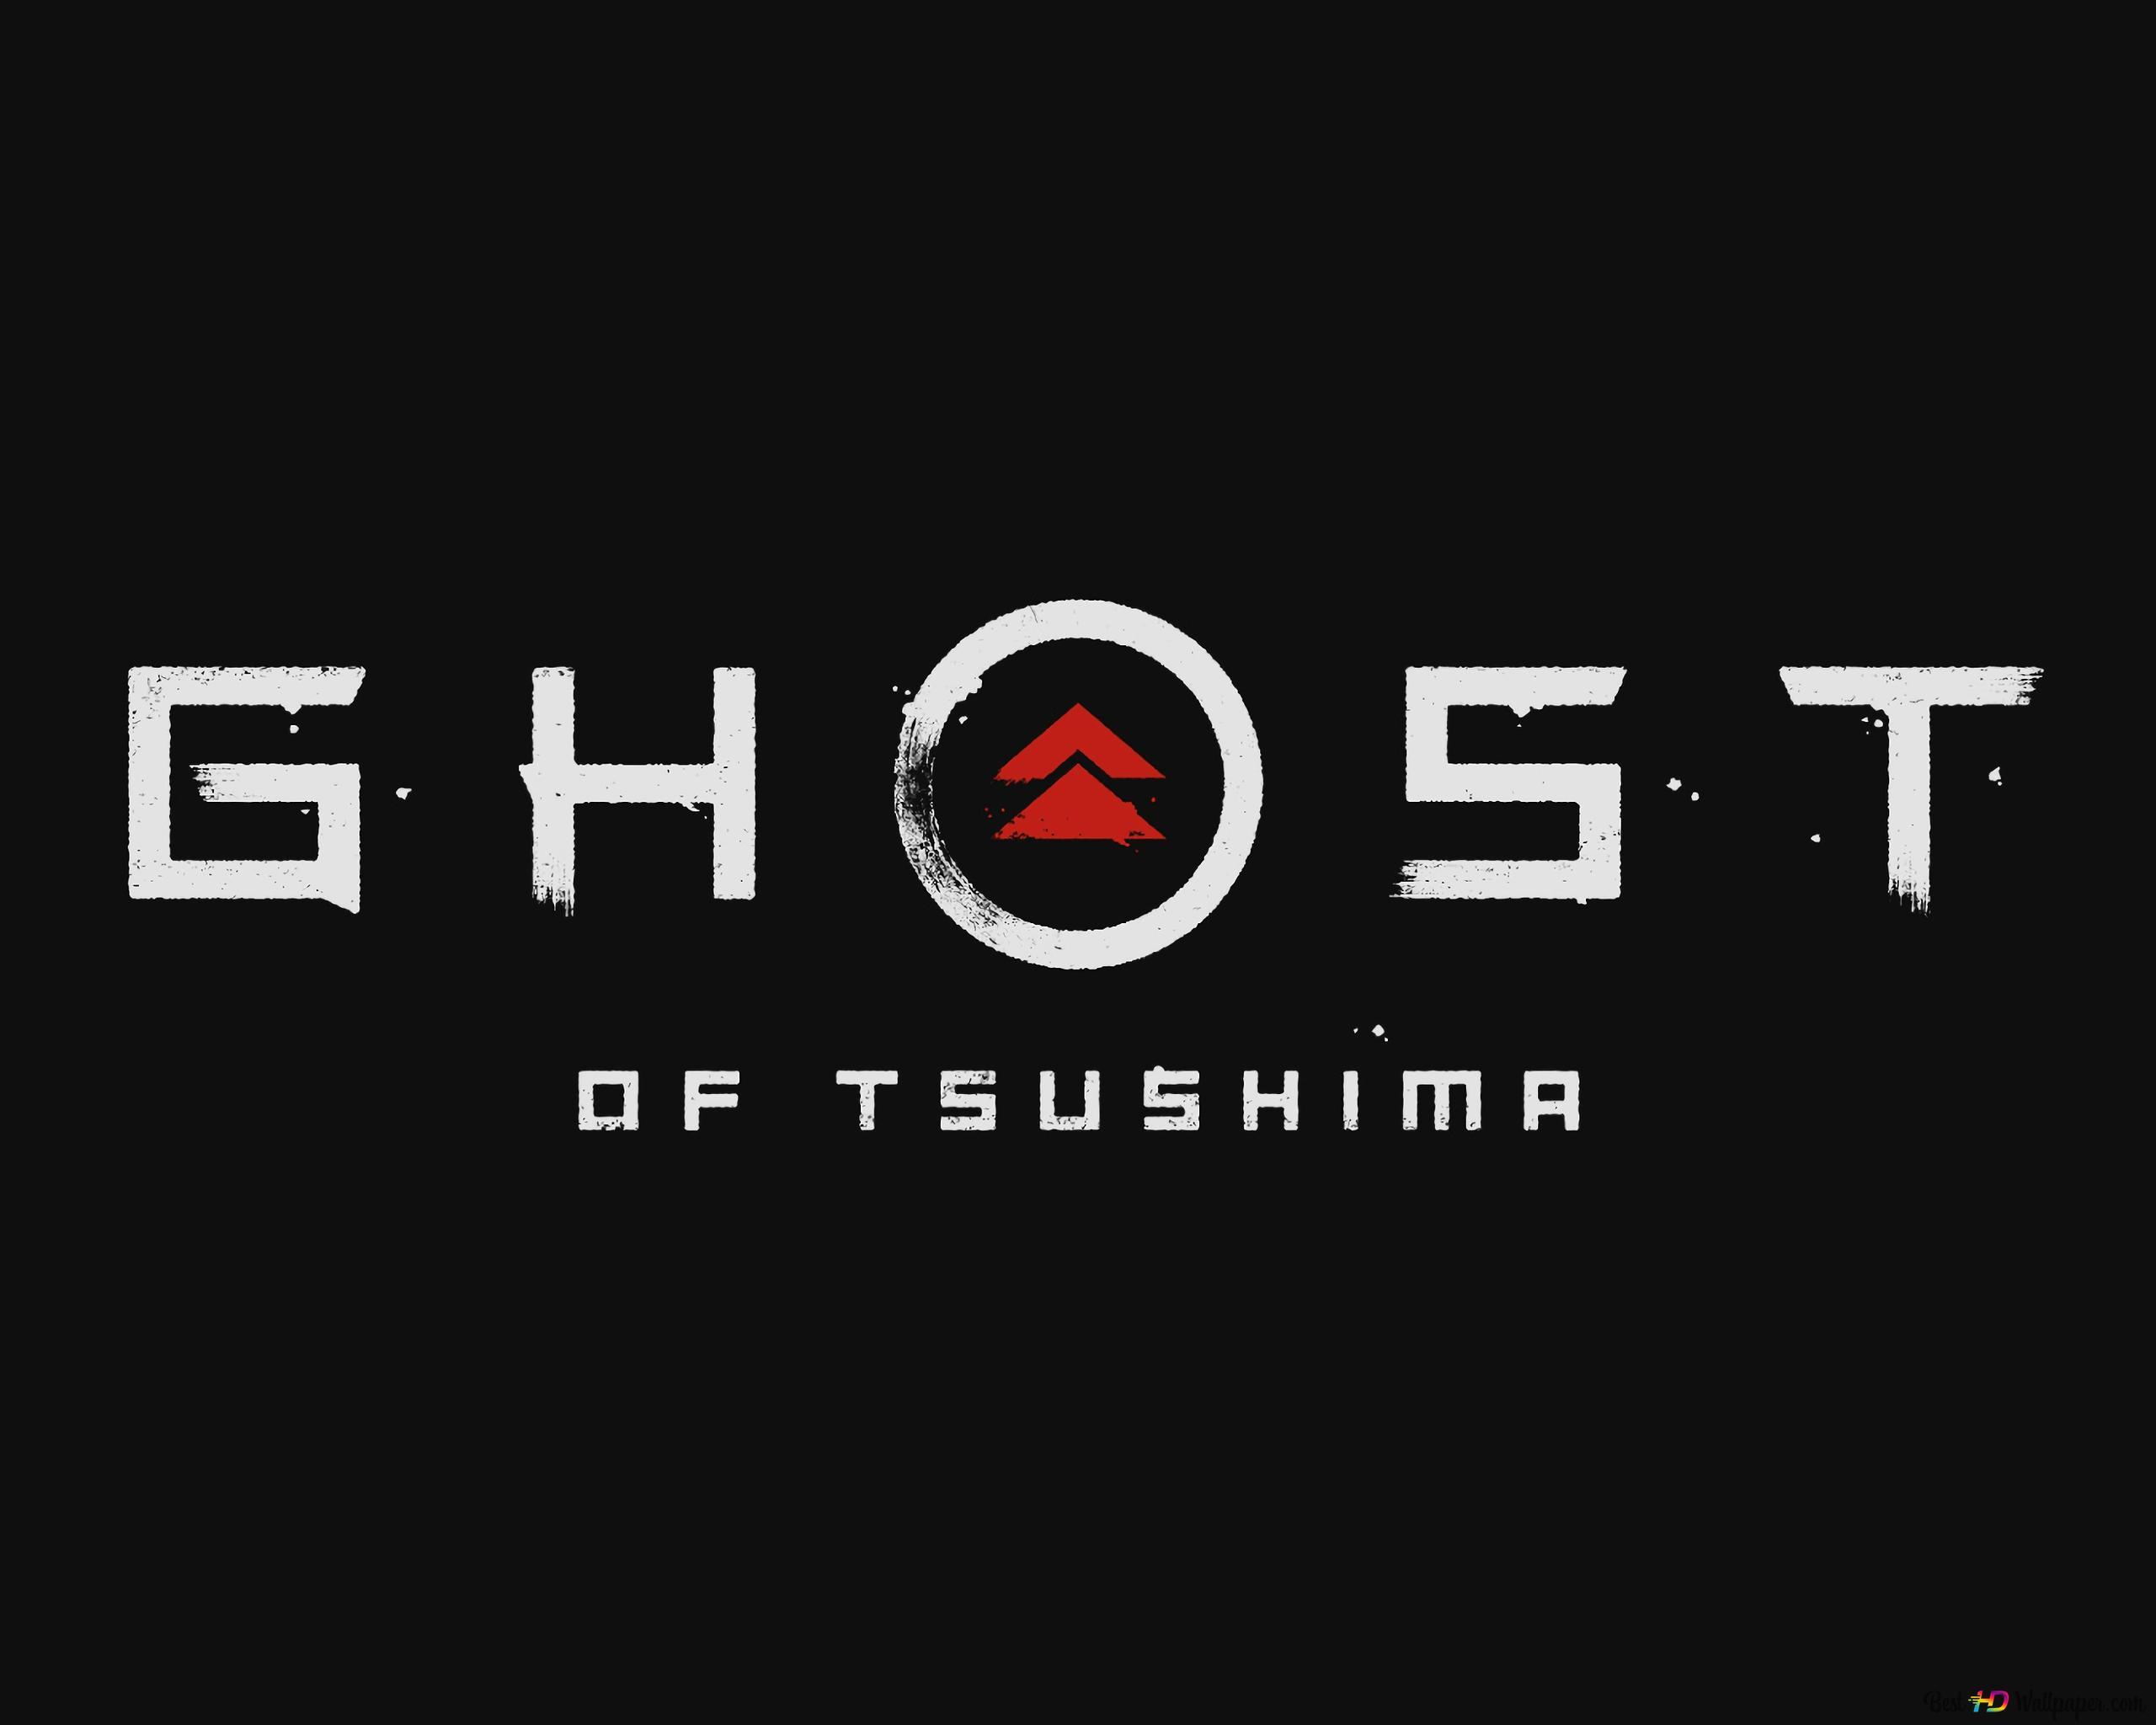 Ghost Of Tsushima 2019 Logo Hd Wallpaper Download